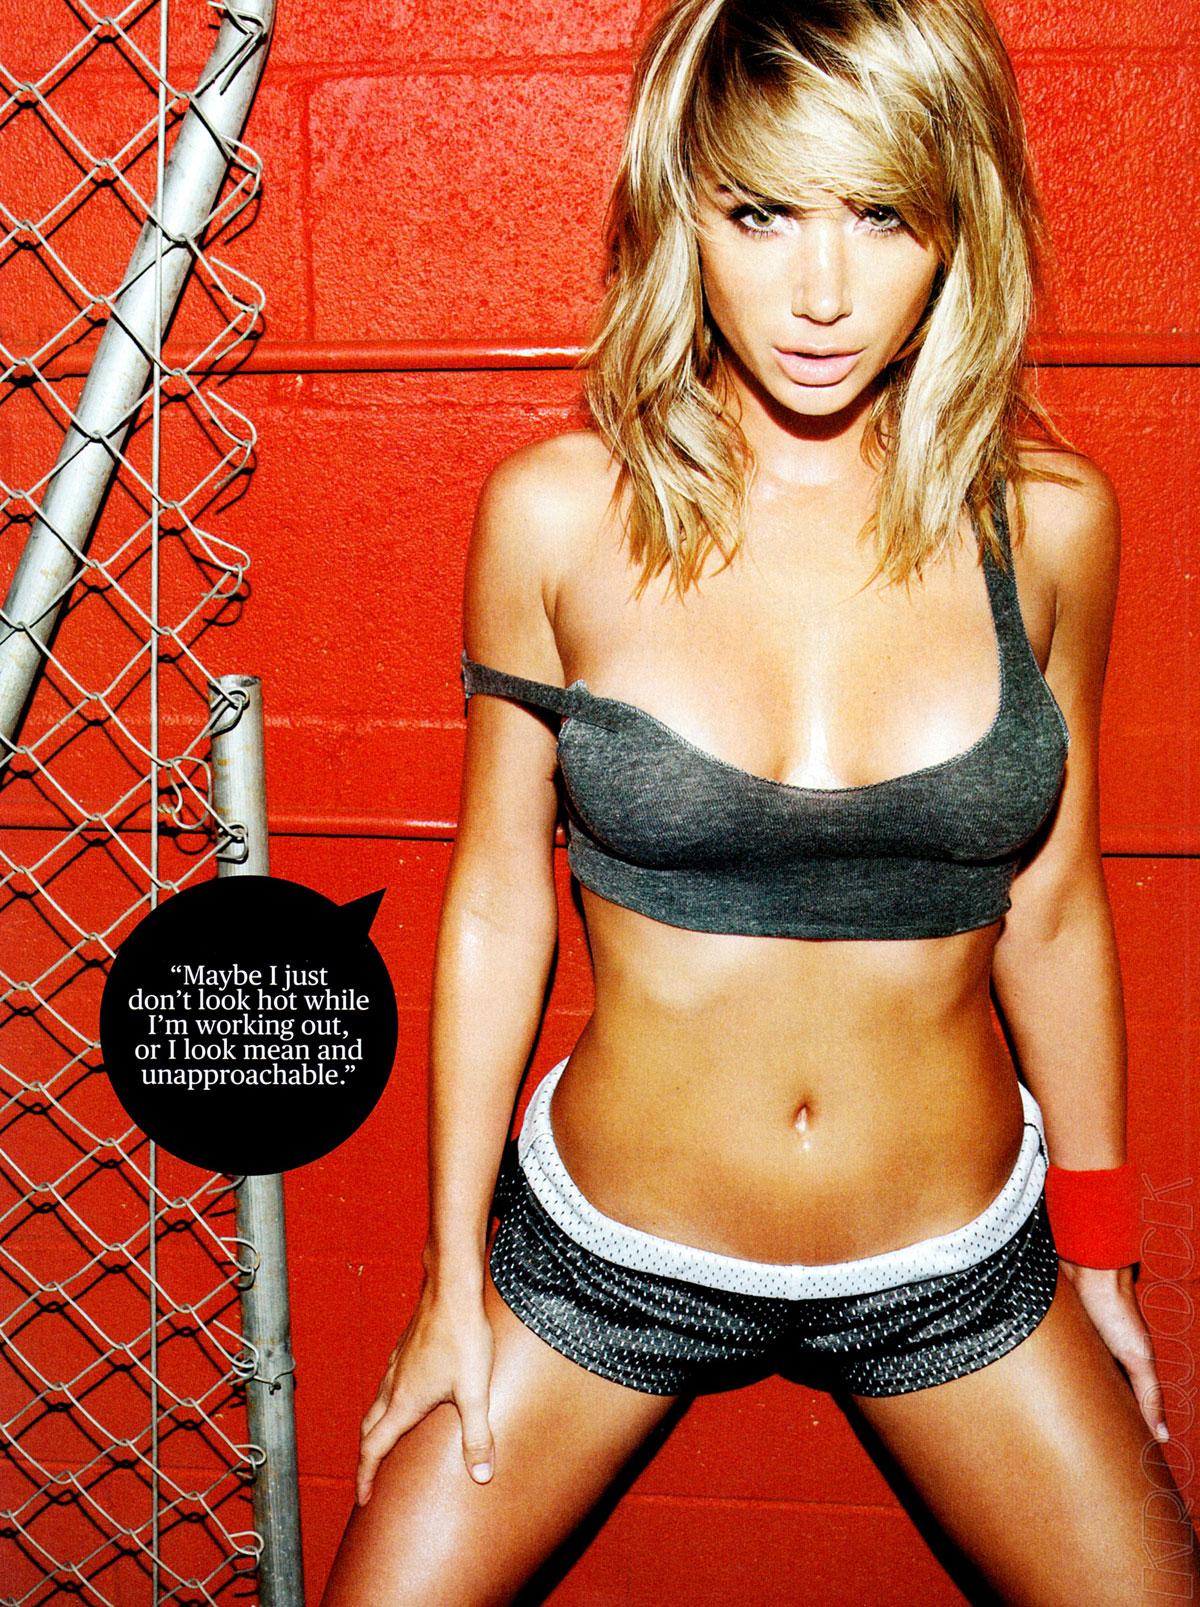 Sara Jean Underwood Bike Top sara jean underwood in men's fitness magazine, june 2012 issue